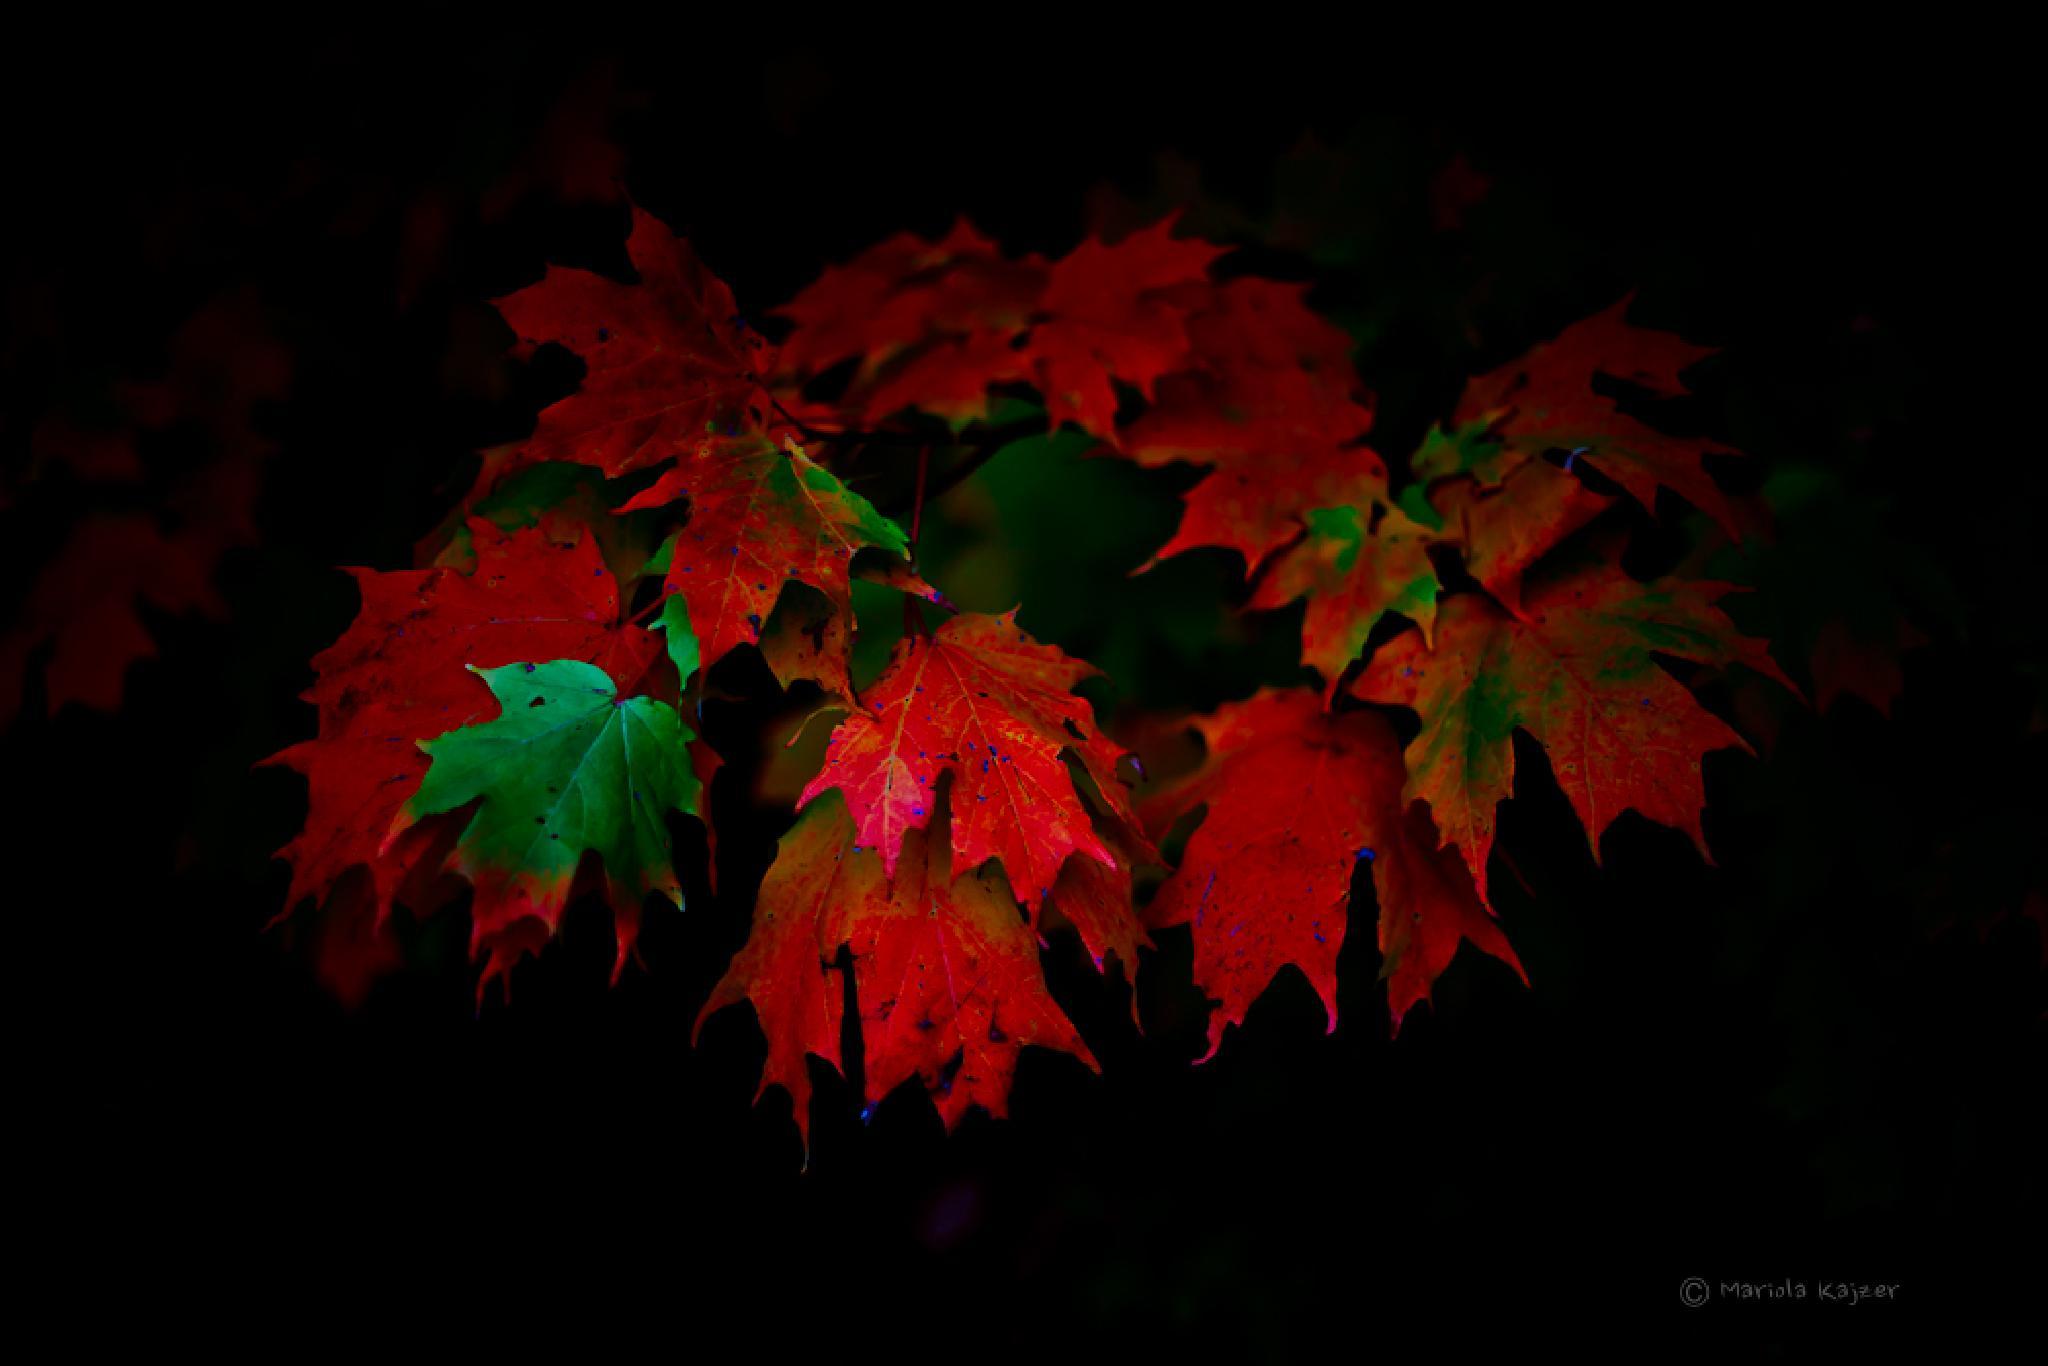 leaves  by mariola.kajzer.1